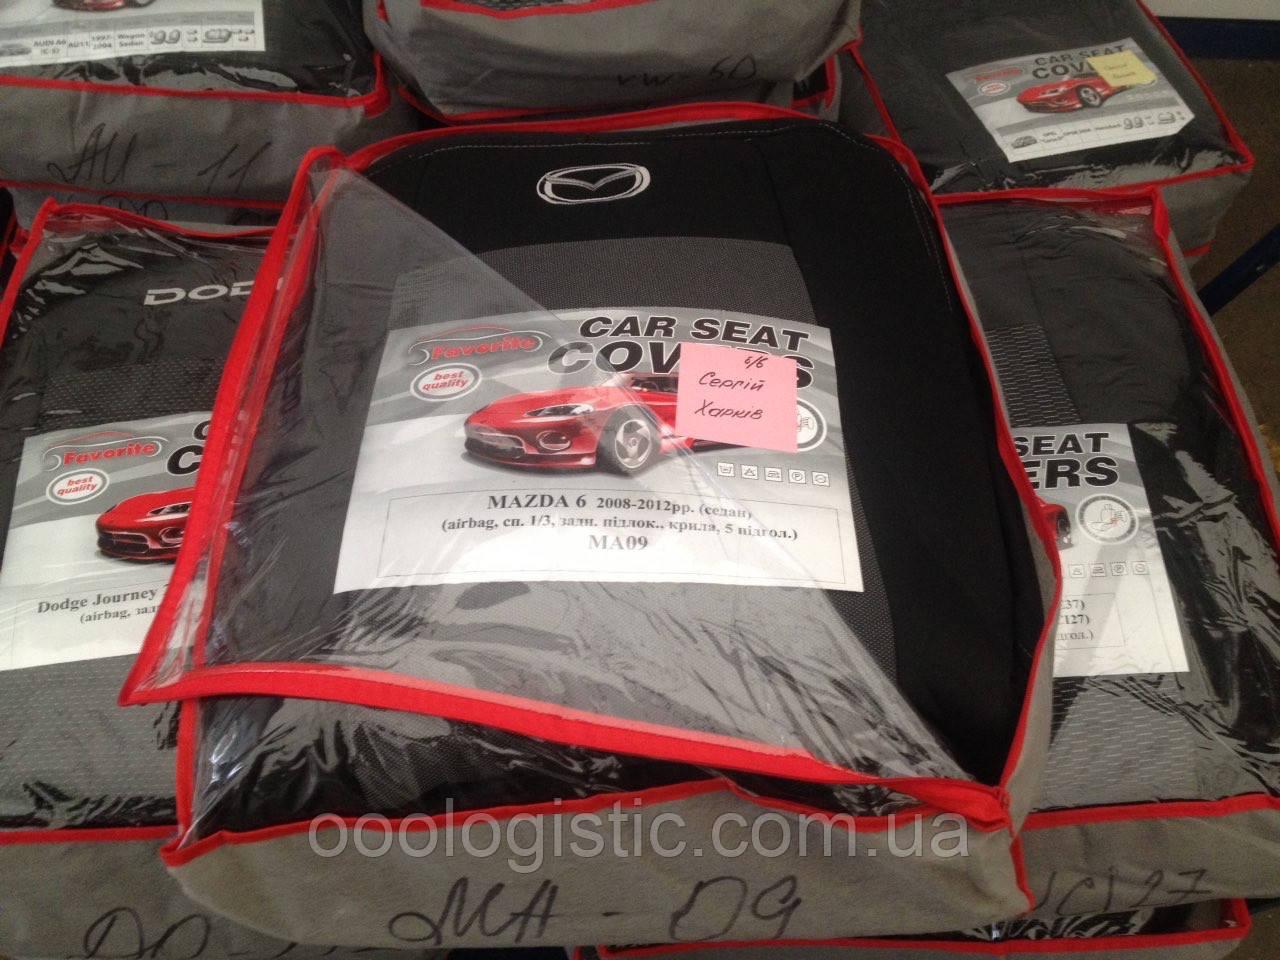 Авточехлы  на Mazda 6 2008-2012 sedan, Мазда 6 2008-2012 года седан